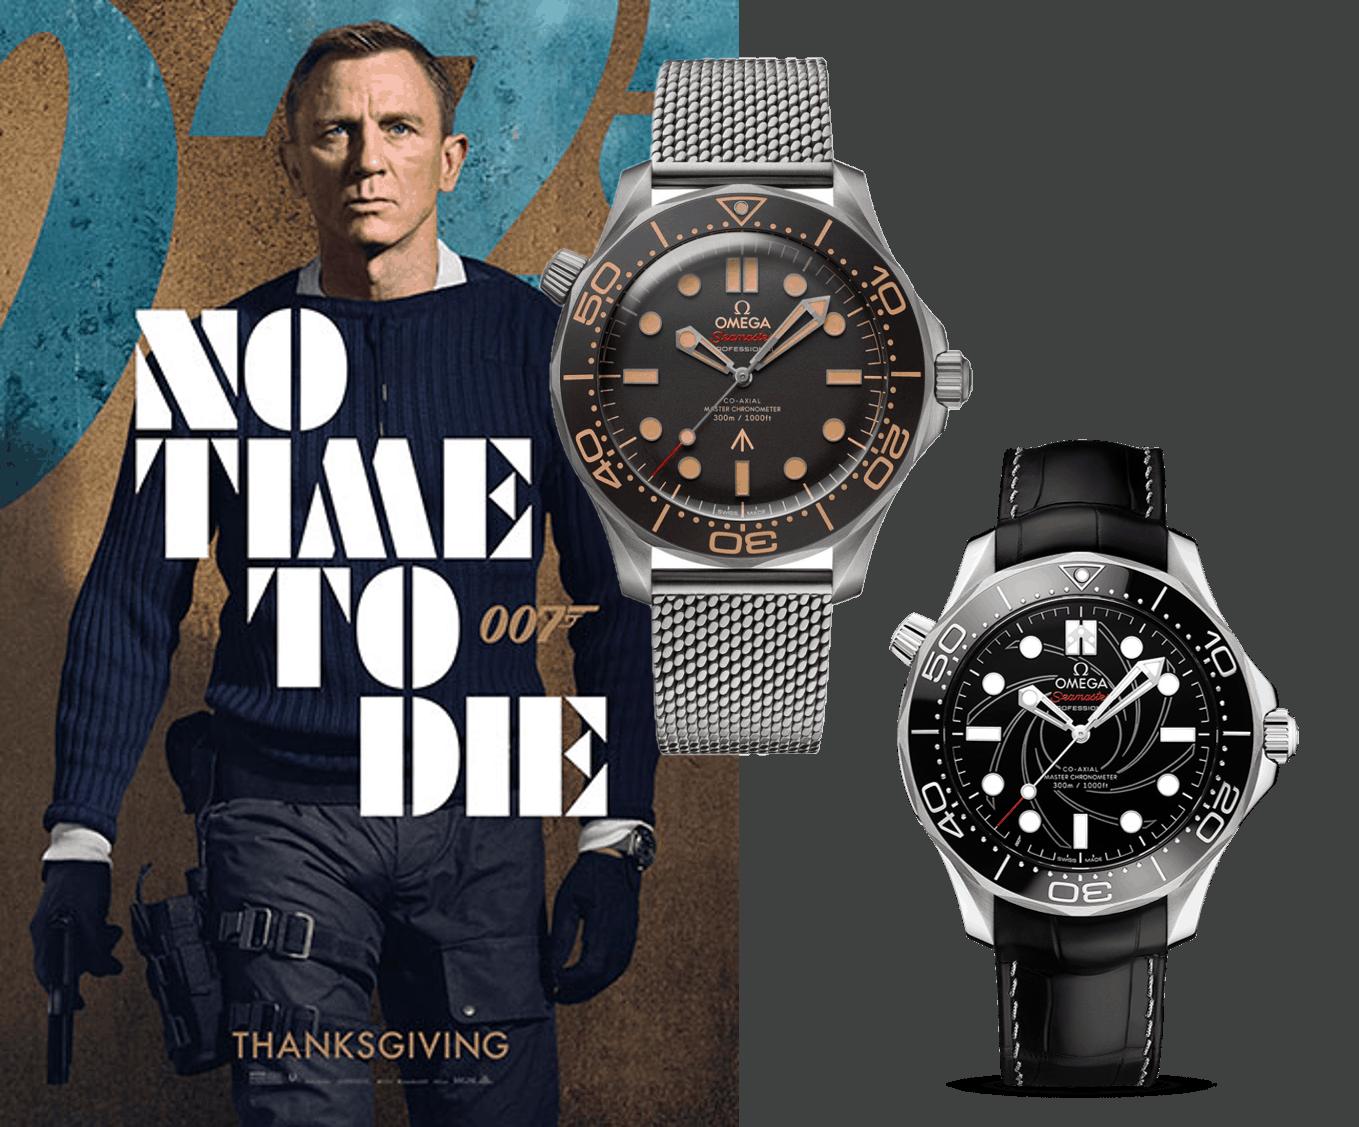 Omega Seamaster Diver 300m 007 James Bond Uhren No Time to die? Dann liegt es an der Omega Seamaster Diver 300M James Bond Uhr!